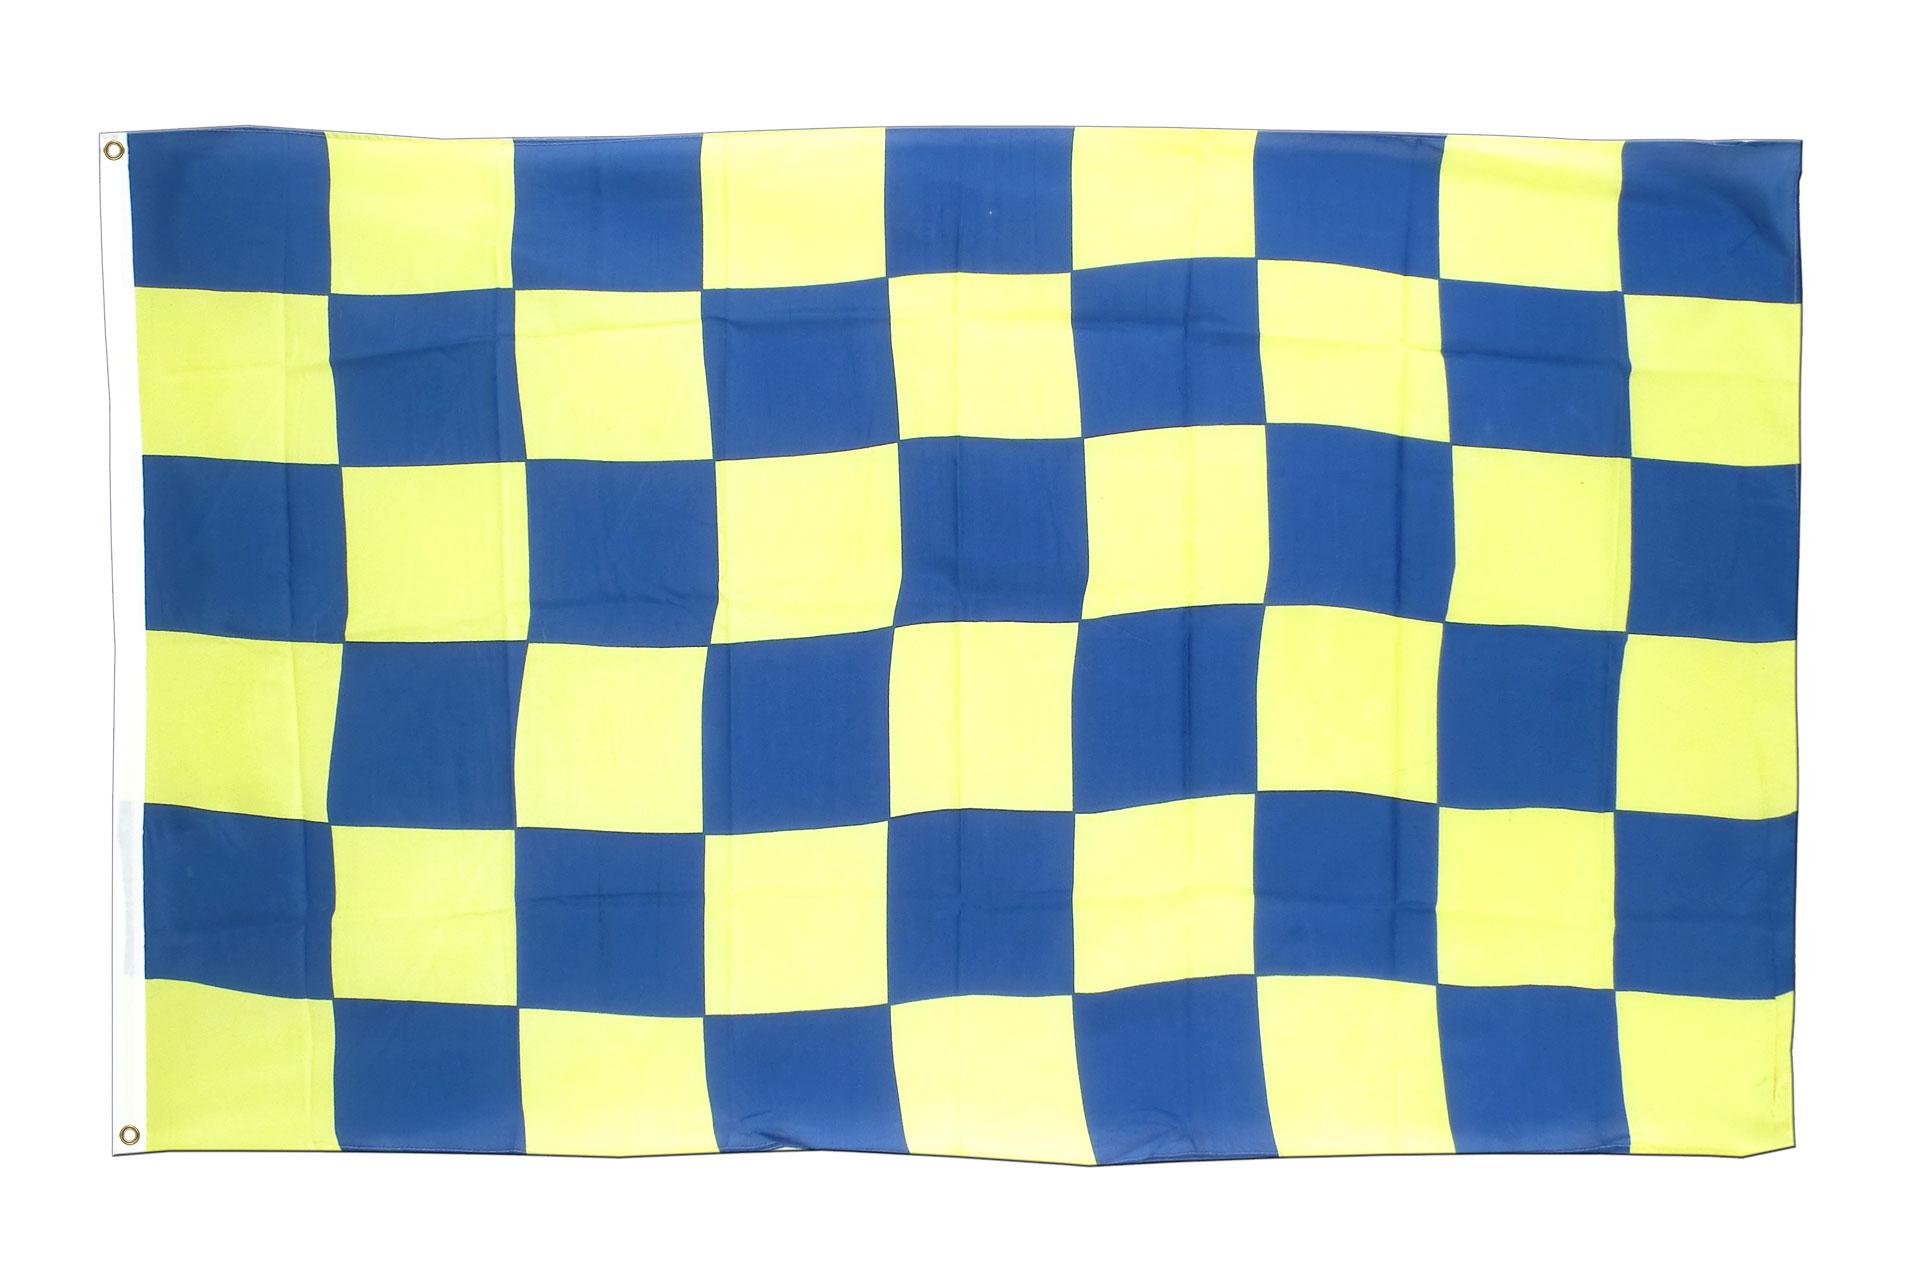 kariert blau gelb flagge blau gelbe fahne 90x150 cm im. Black Bedroom Furniture Sets. Home Design Ideas